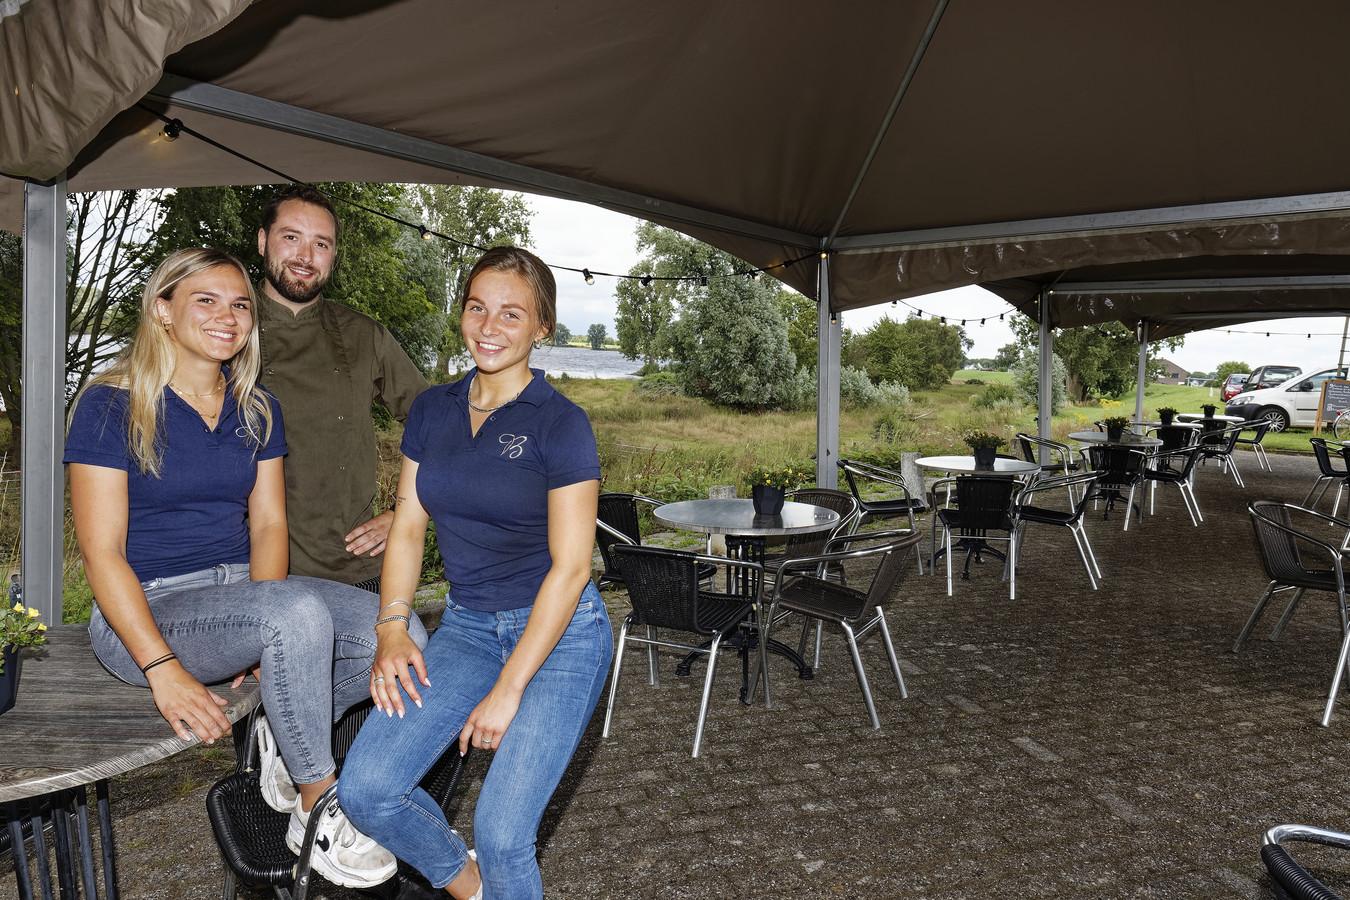 Vlnr: Eva Brekelmans, eigenaar Rens Kemp en Sanne Paloltzka op het terras van De Blauwe Sluis.